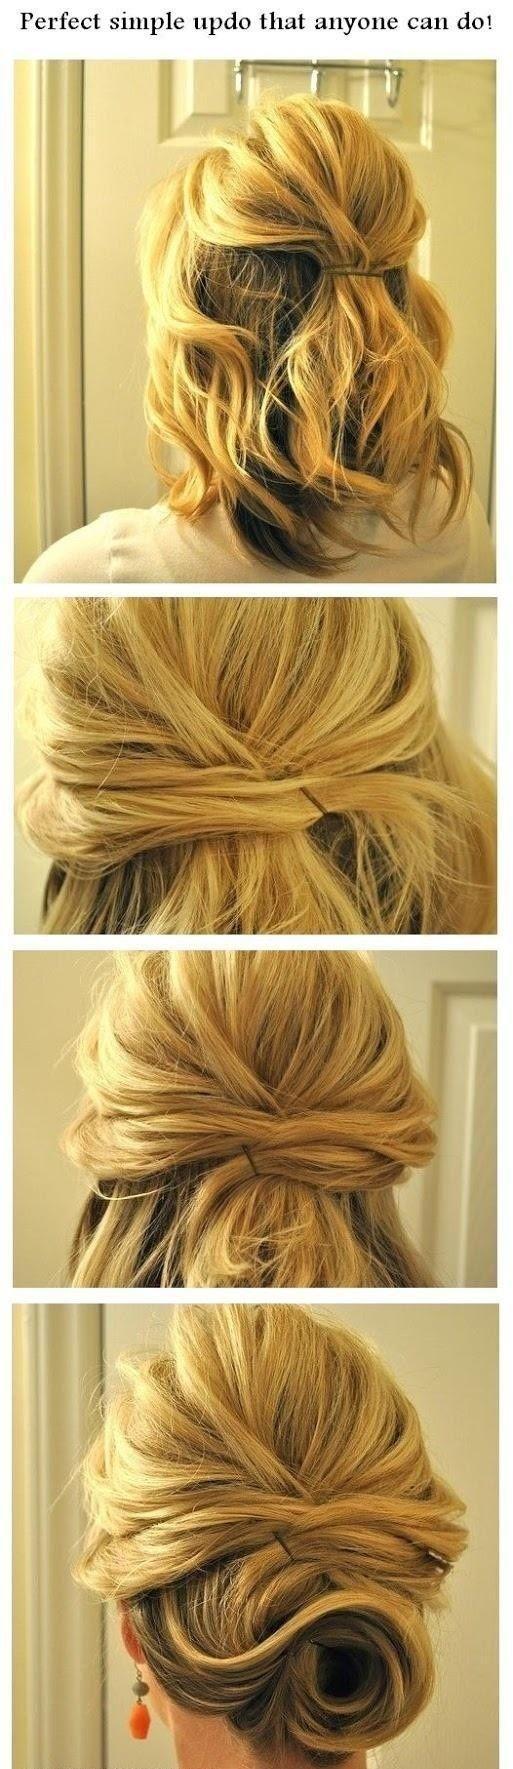 Astounding 15 Cute Easy Hairstyle Tutorials For Medium Length Hair Gurl Com Short Hairstyles For Black Women Fulllsitofus